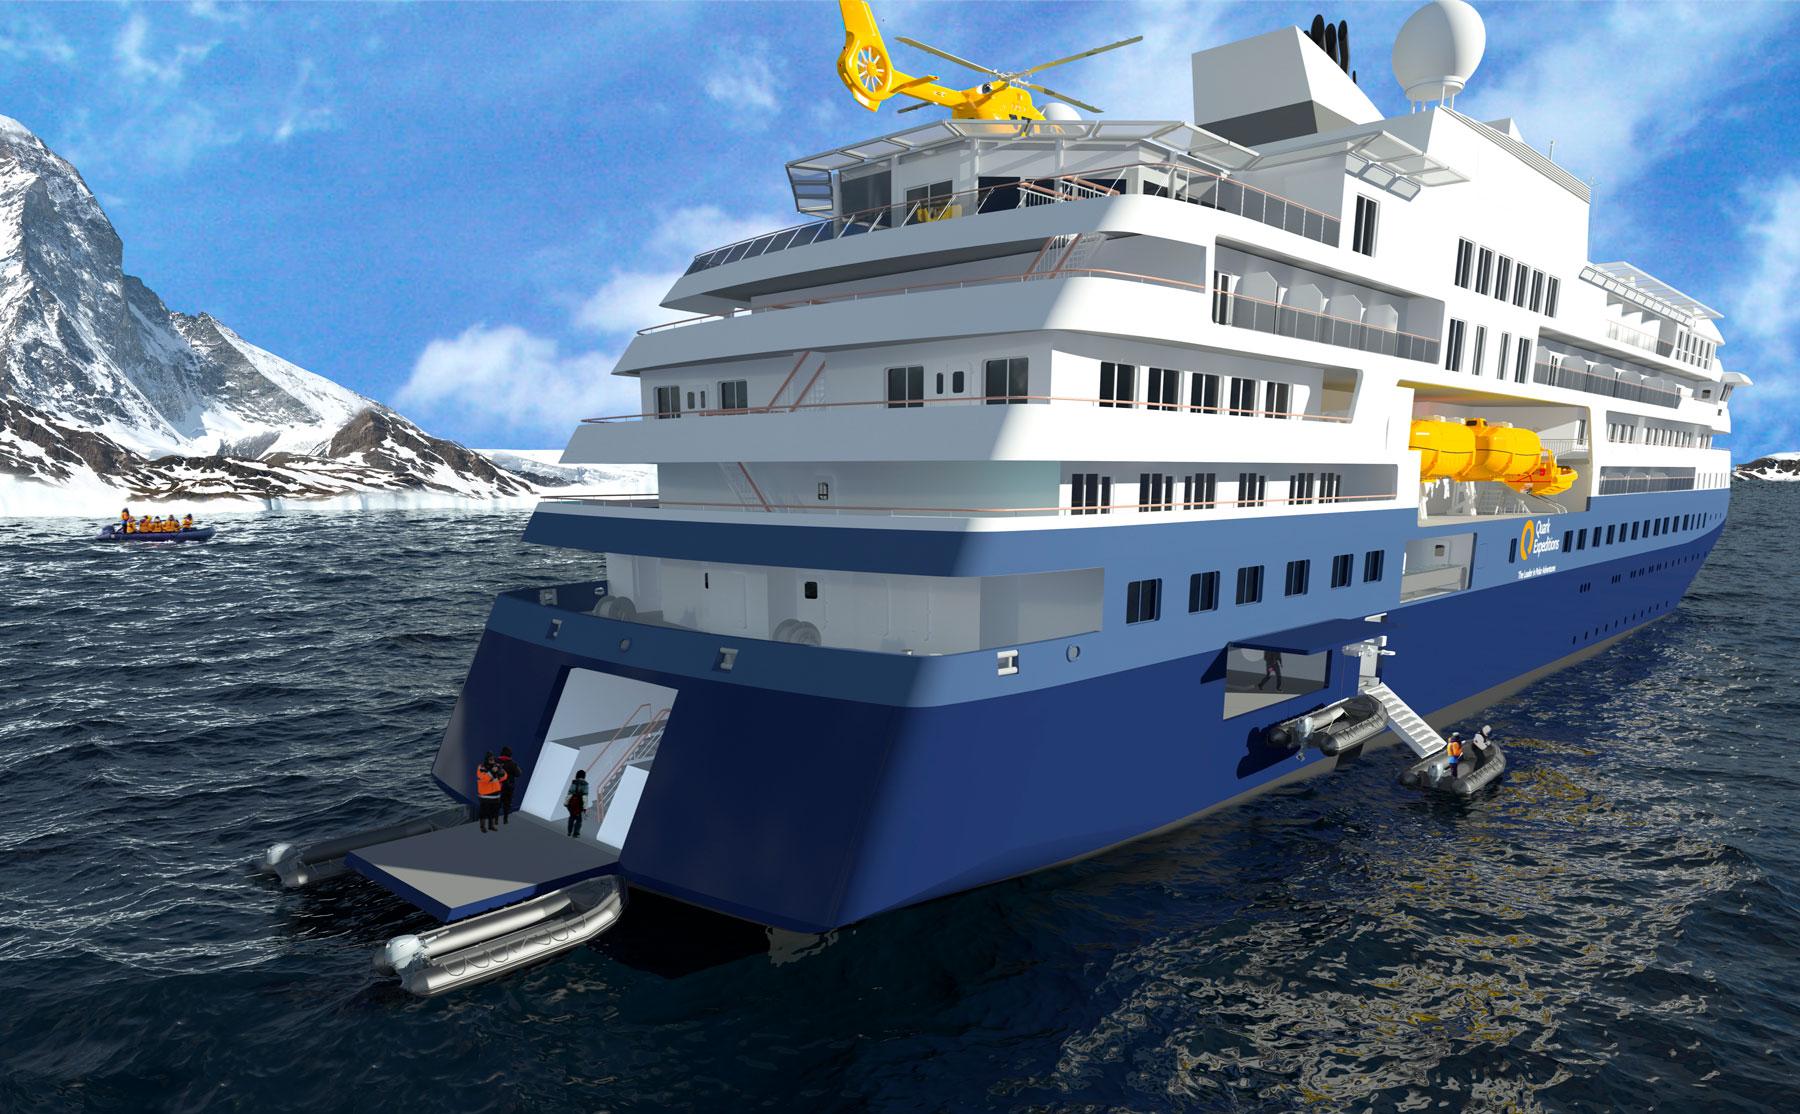 Ship (Ultramarine) rendering from rear